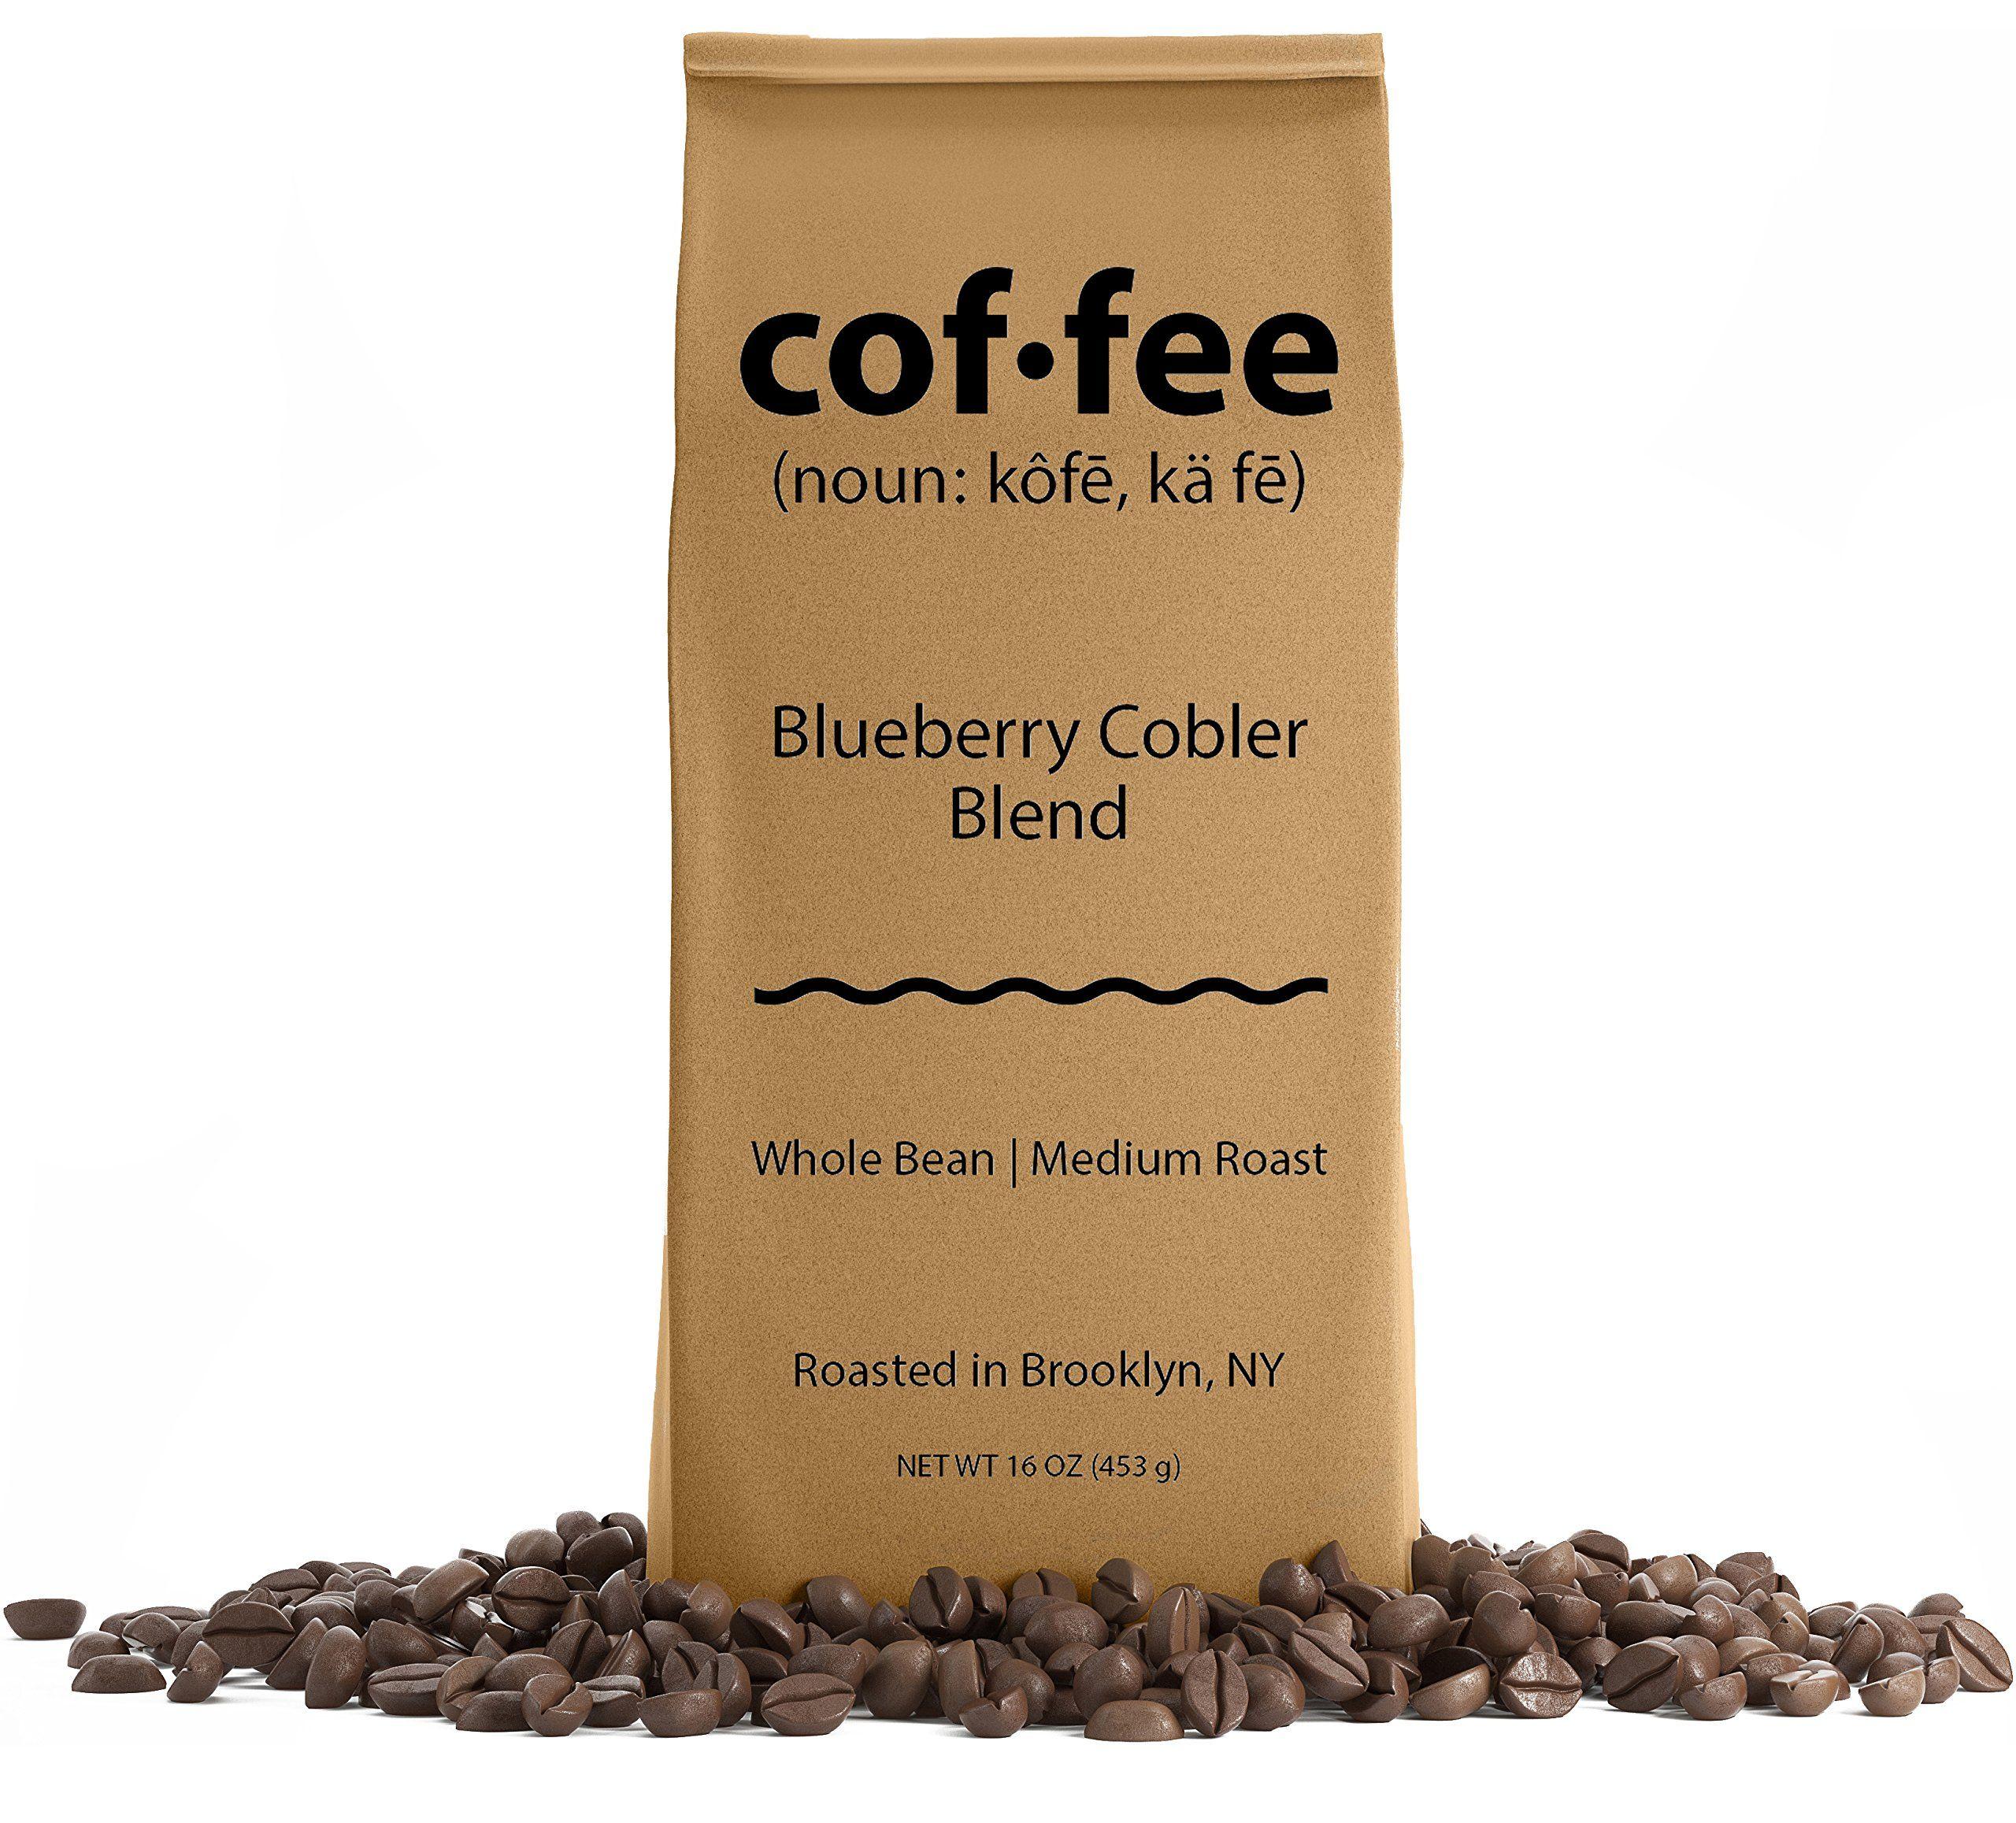 Blueberry cobler blend whole bean coffee medium roast